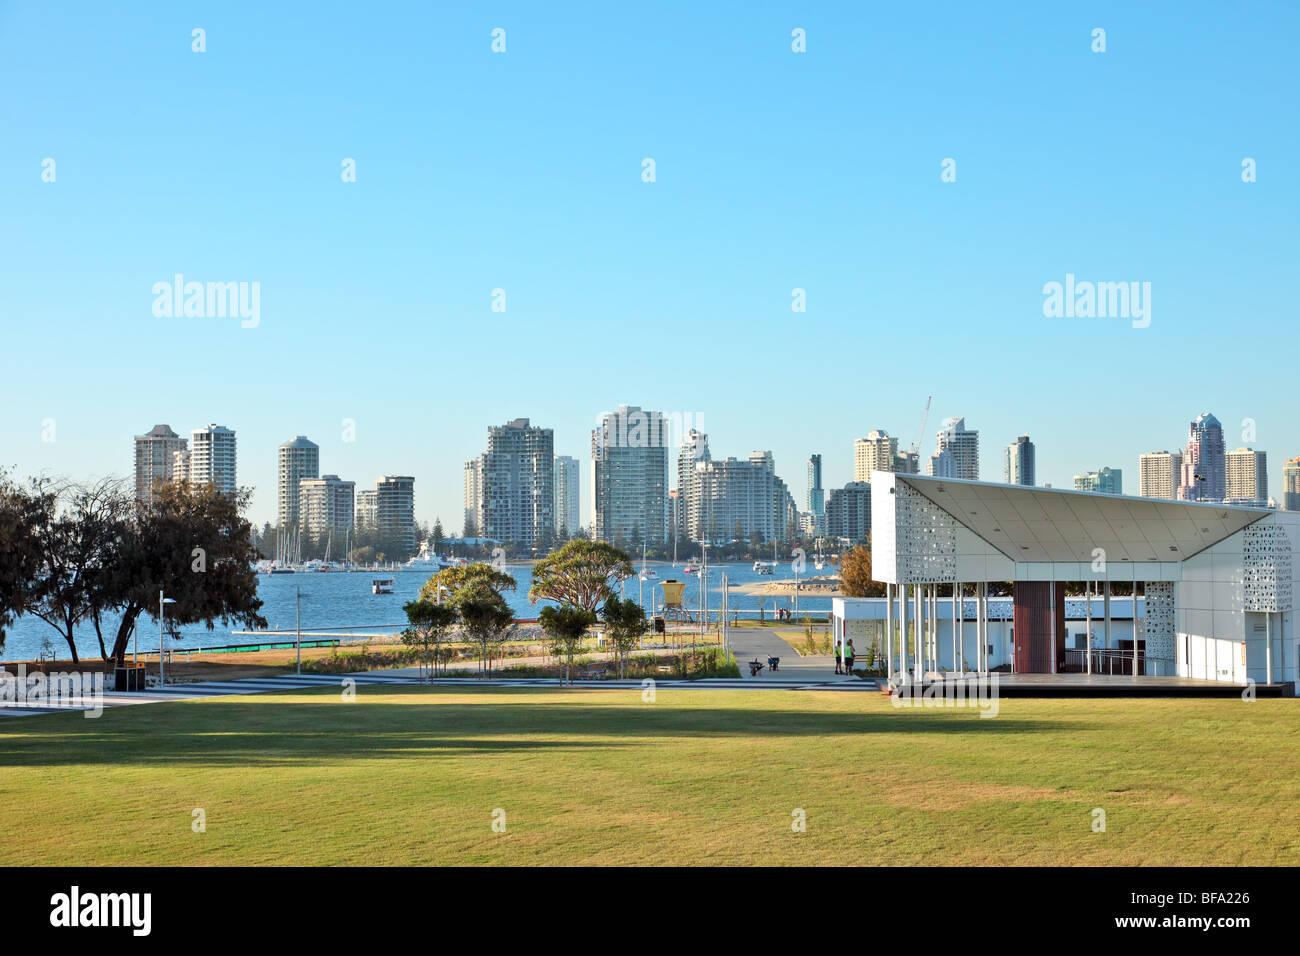 Modern city skyline of Surfers Paradise Queensland Australia - Stock Image